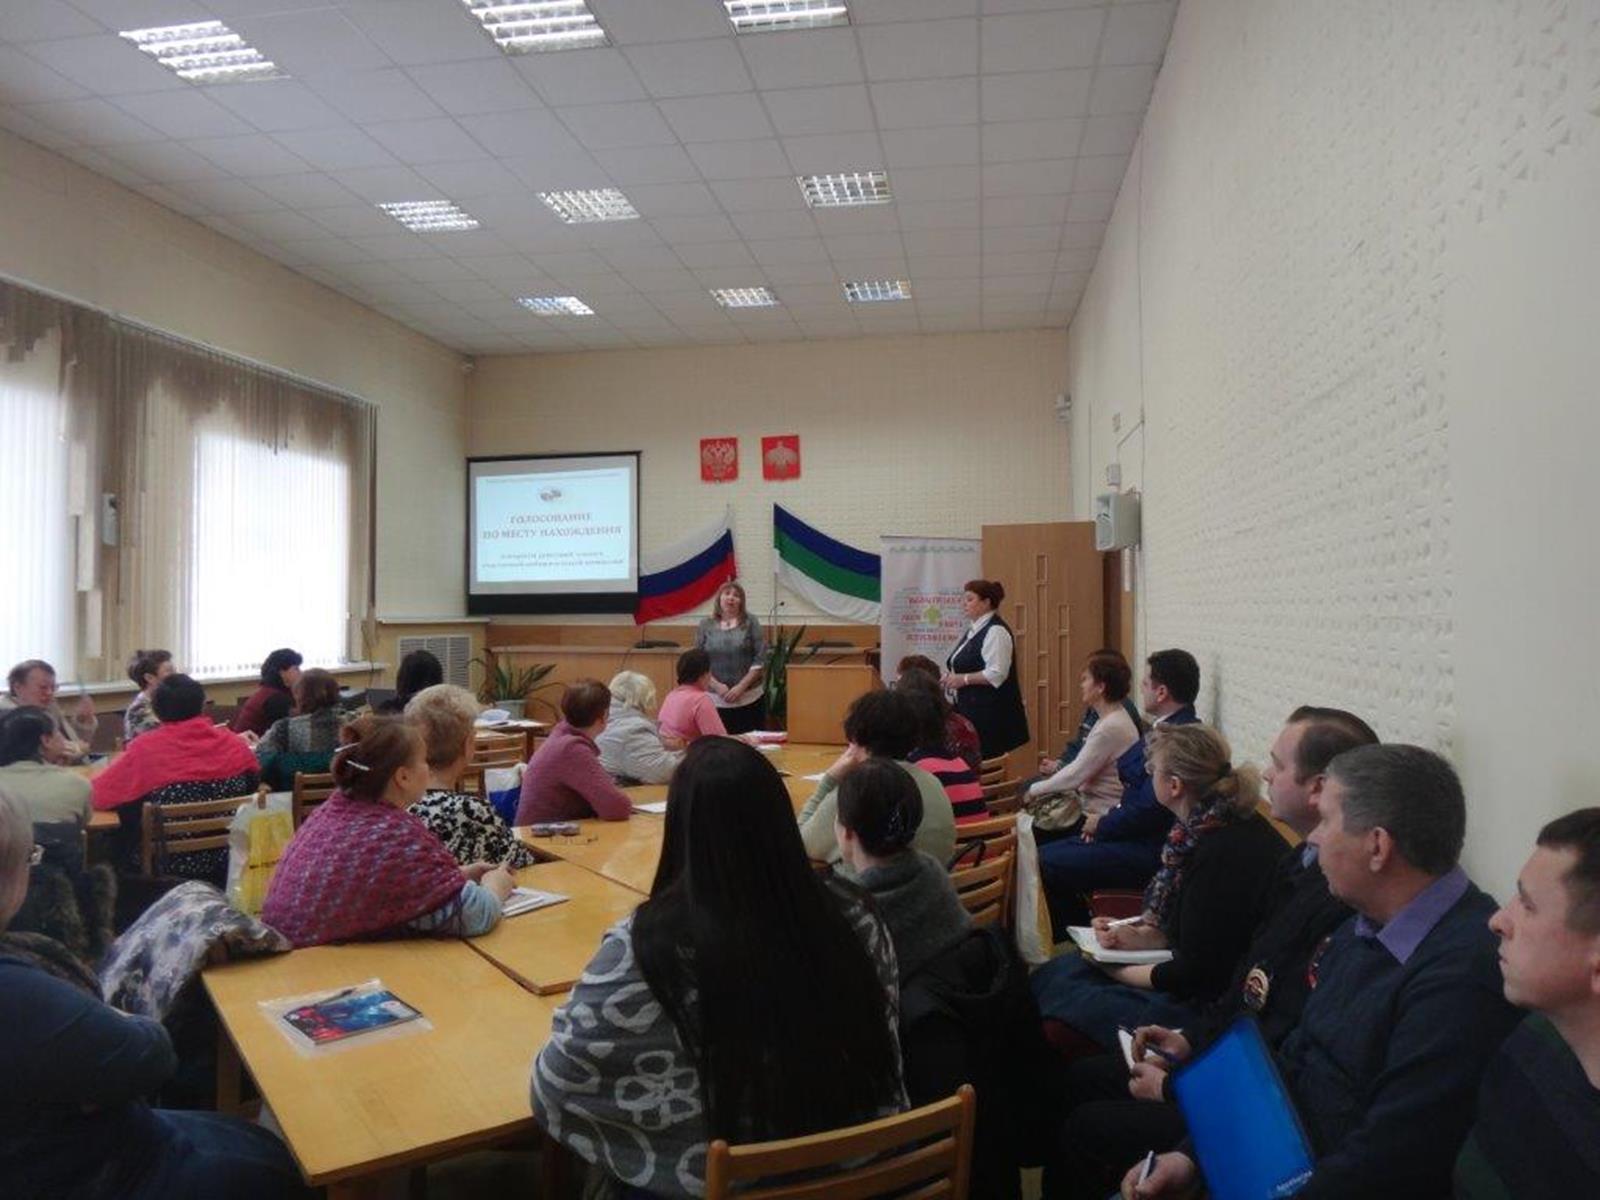 Koigorodok_glavy-SP-ghiteli_14.02.2018.jpg